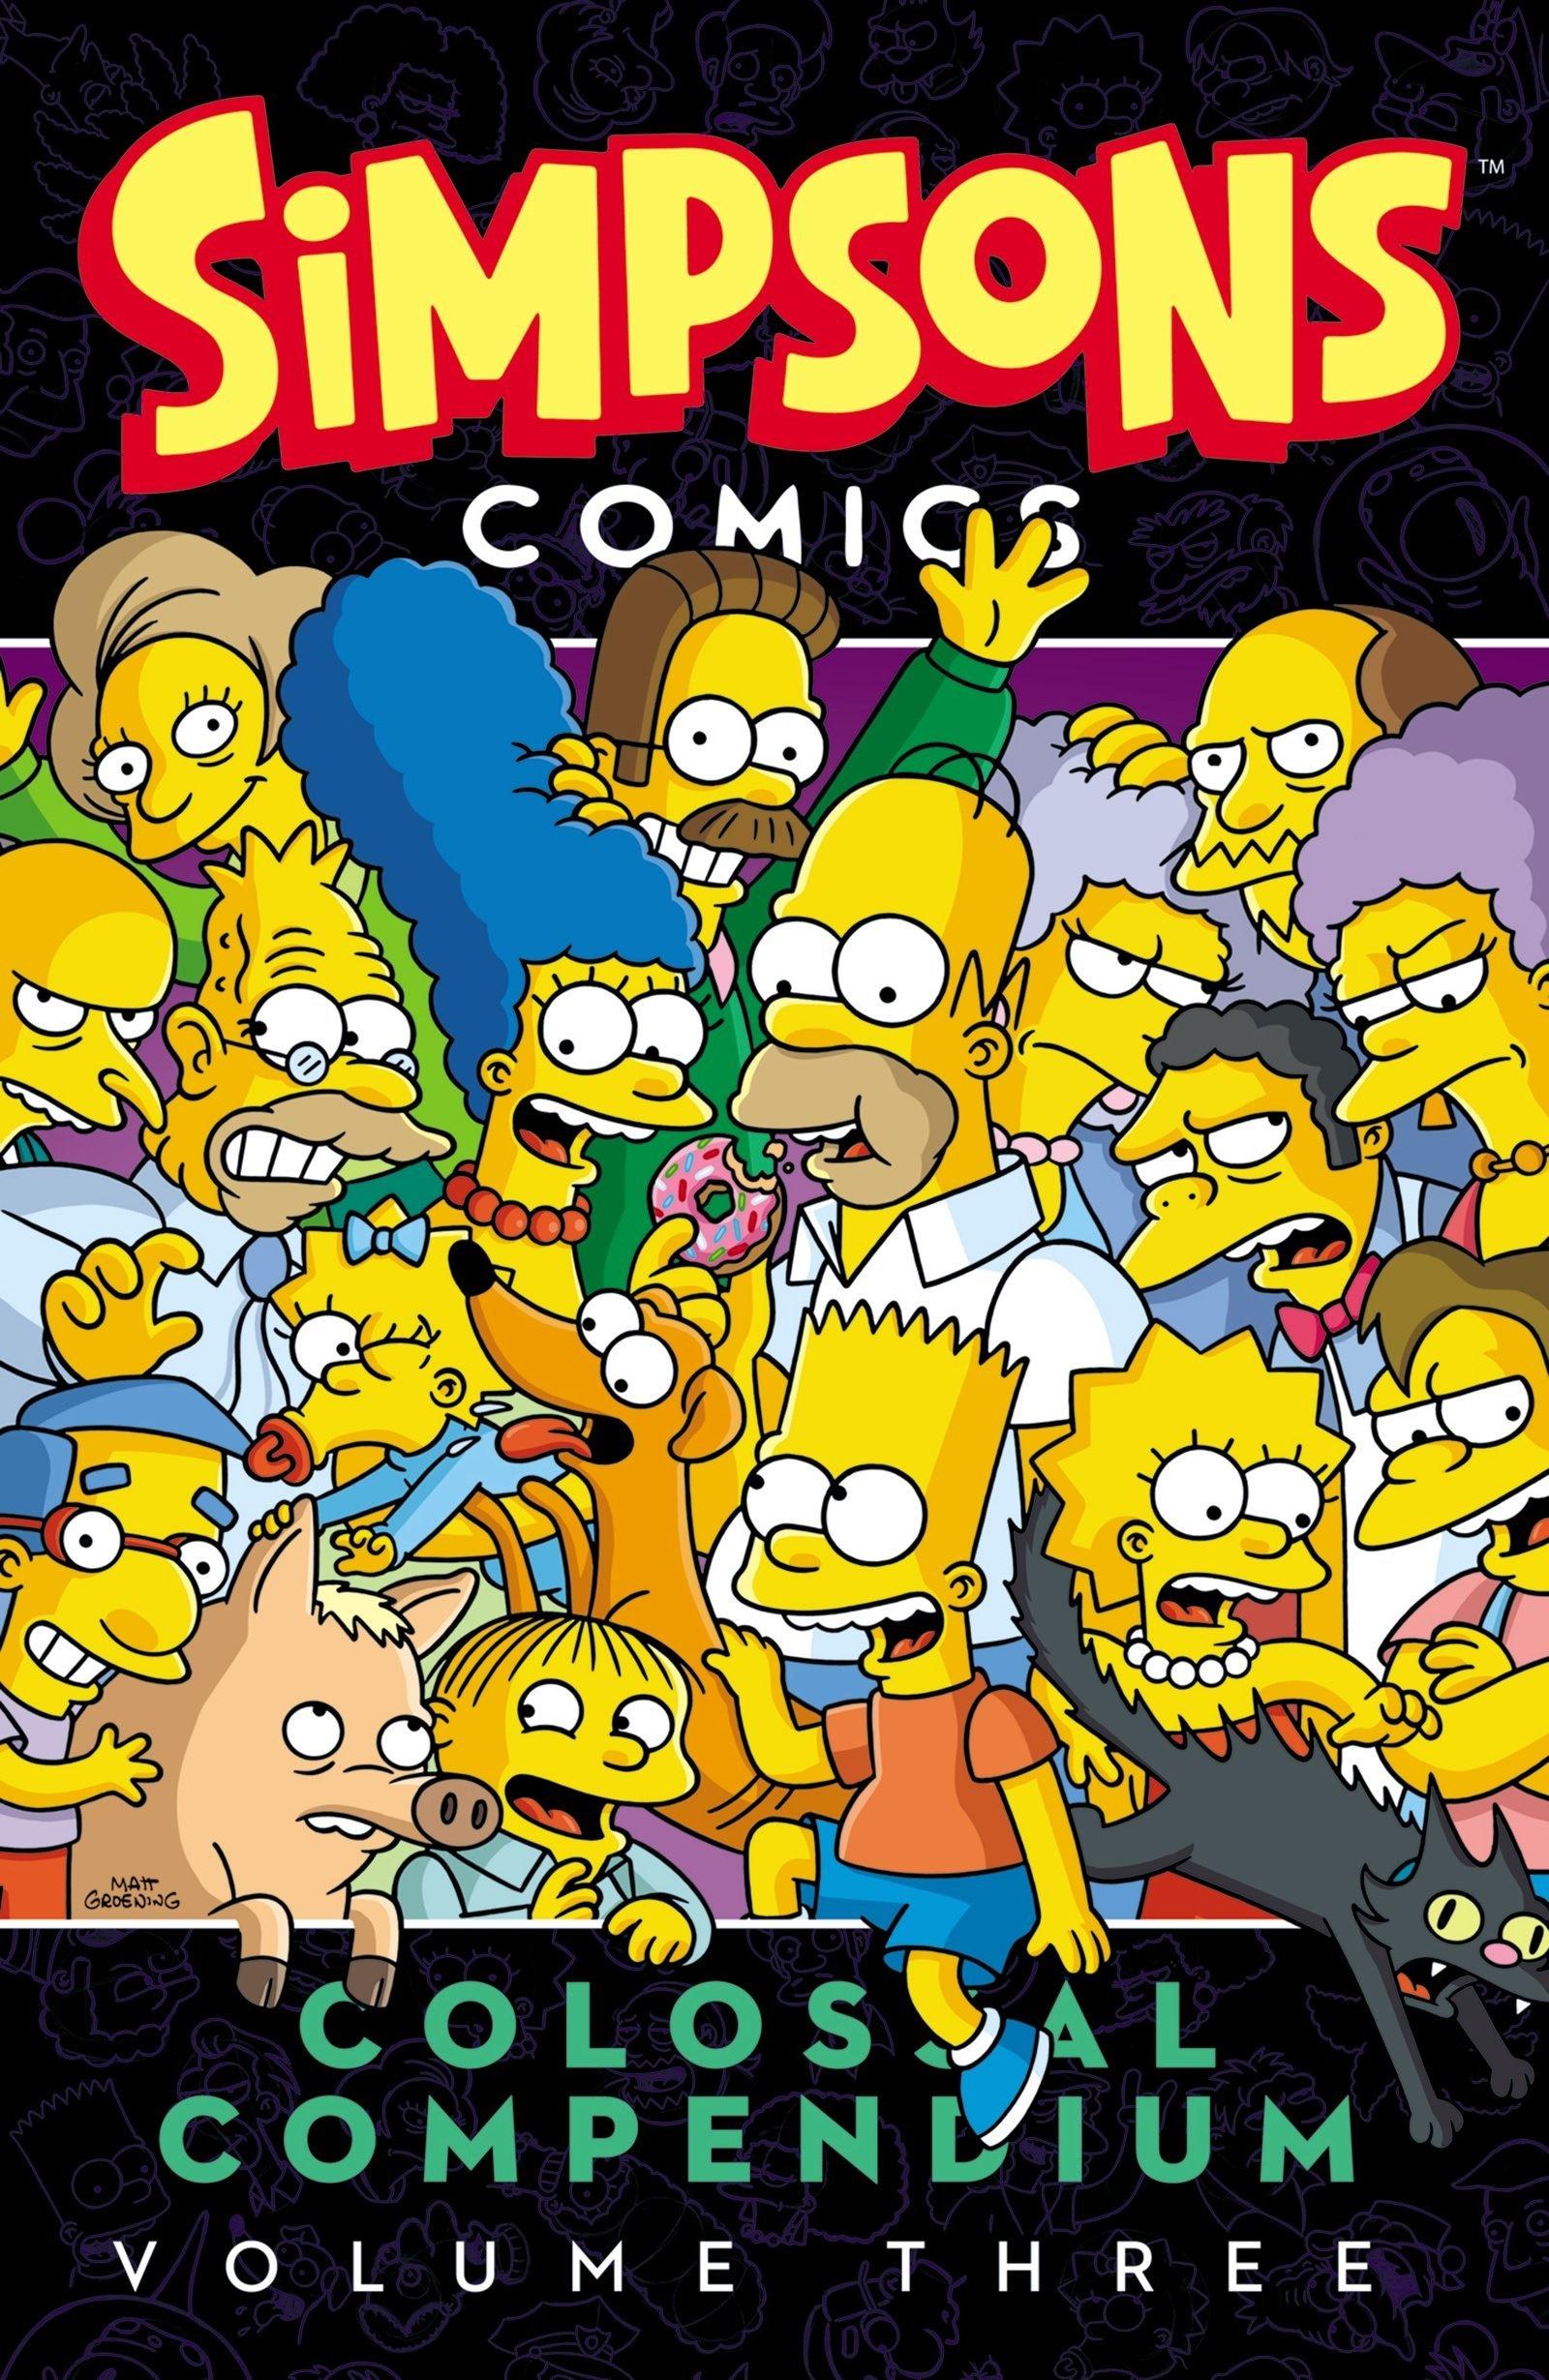 Simpsons Comics Colossal Compendium Volume Three.jpg